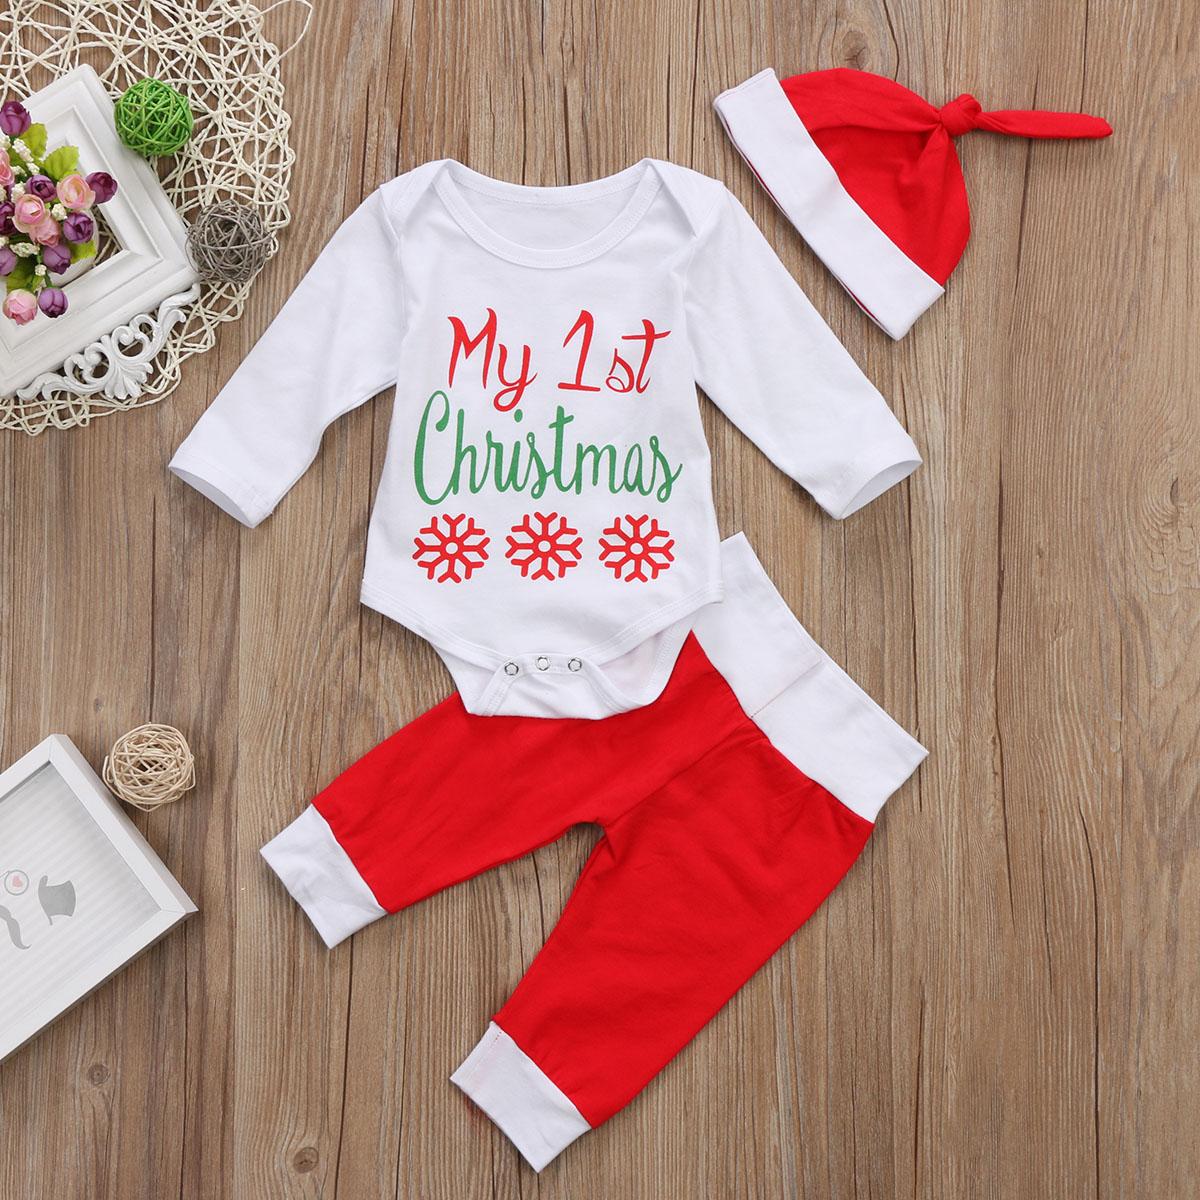 My 1st Christmas Newborn Baby Boy Girl Xmas Clothes Tops Romper